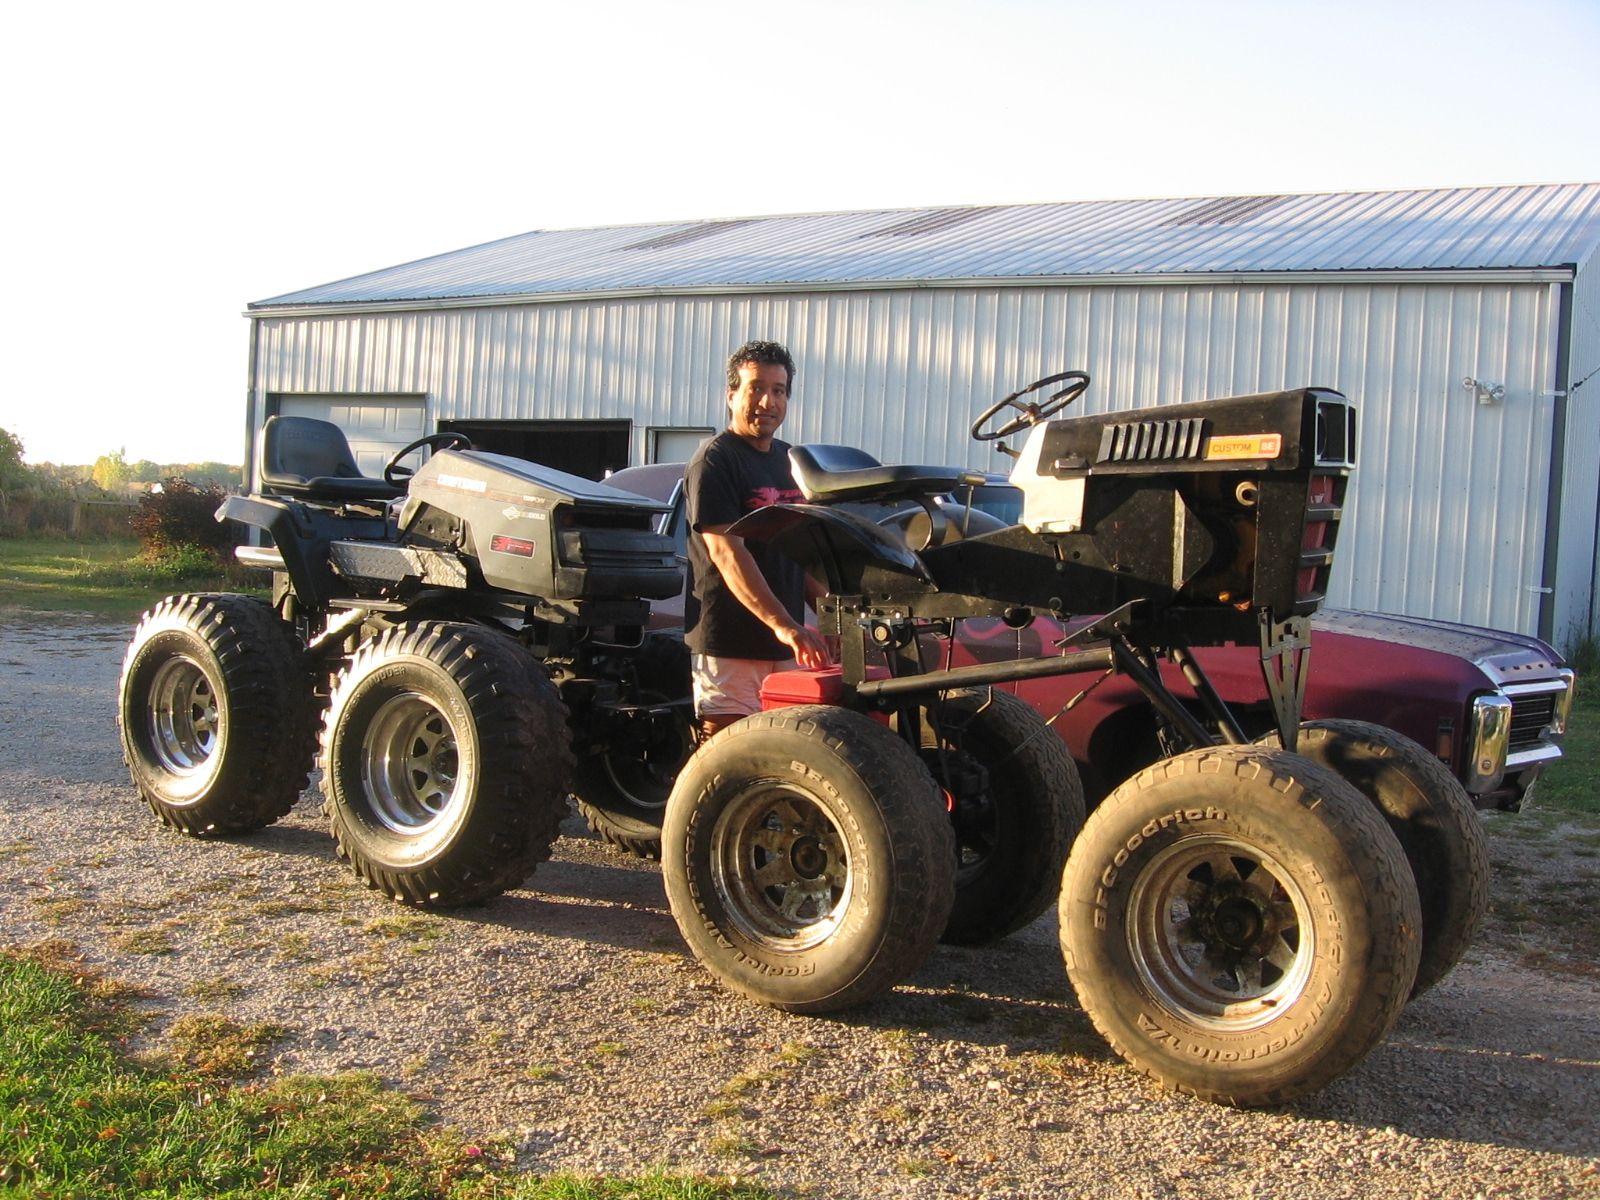 Garden Tractor Custom Truck : Kel s monster mowers w chevy impala xtrememowermayhem